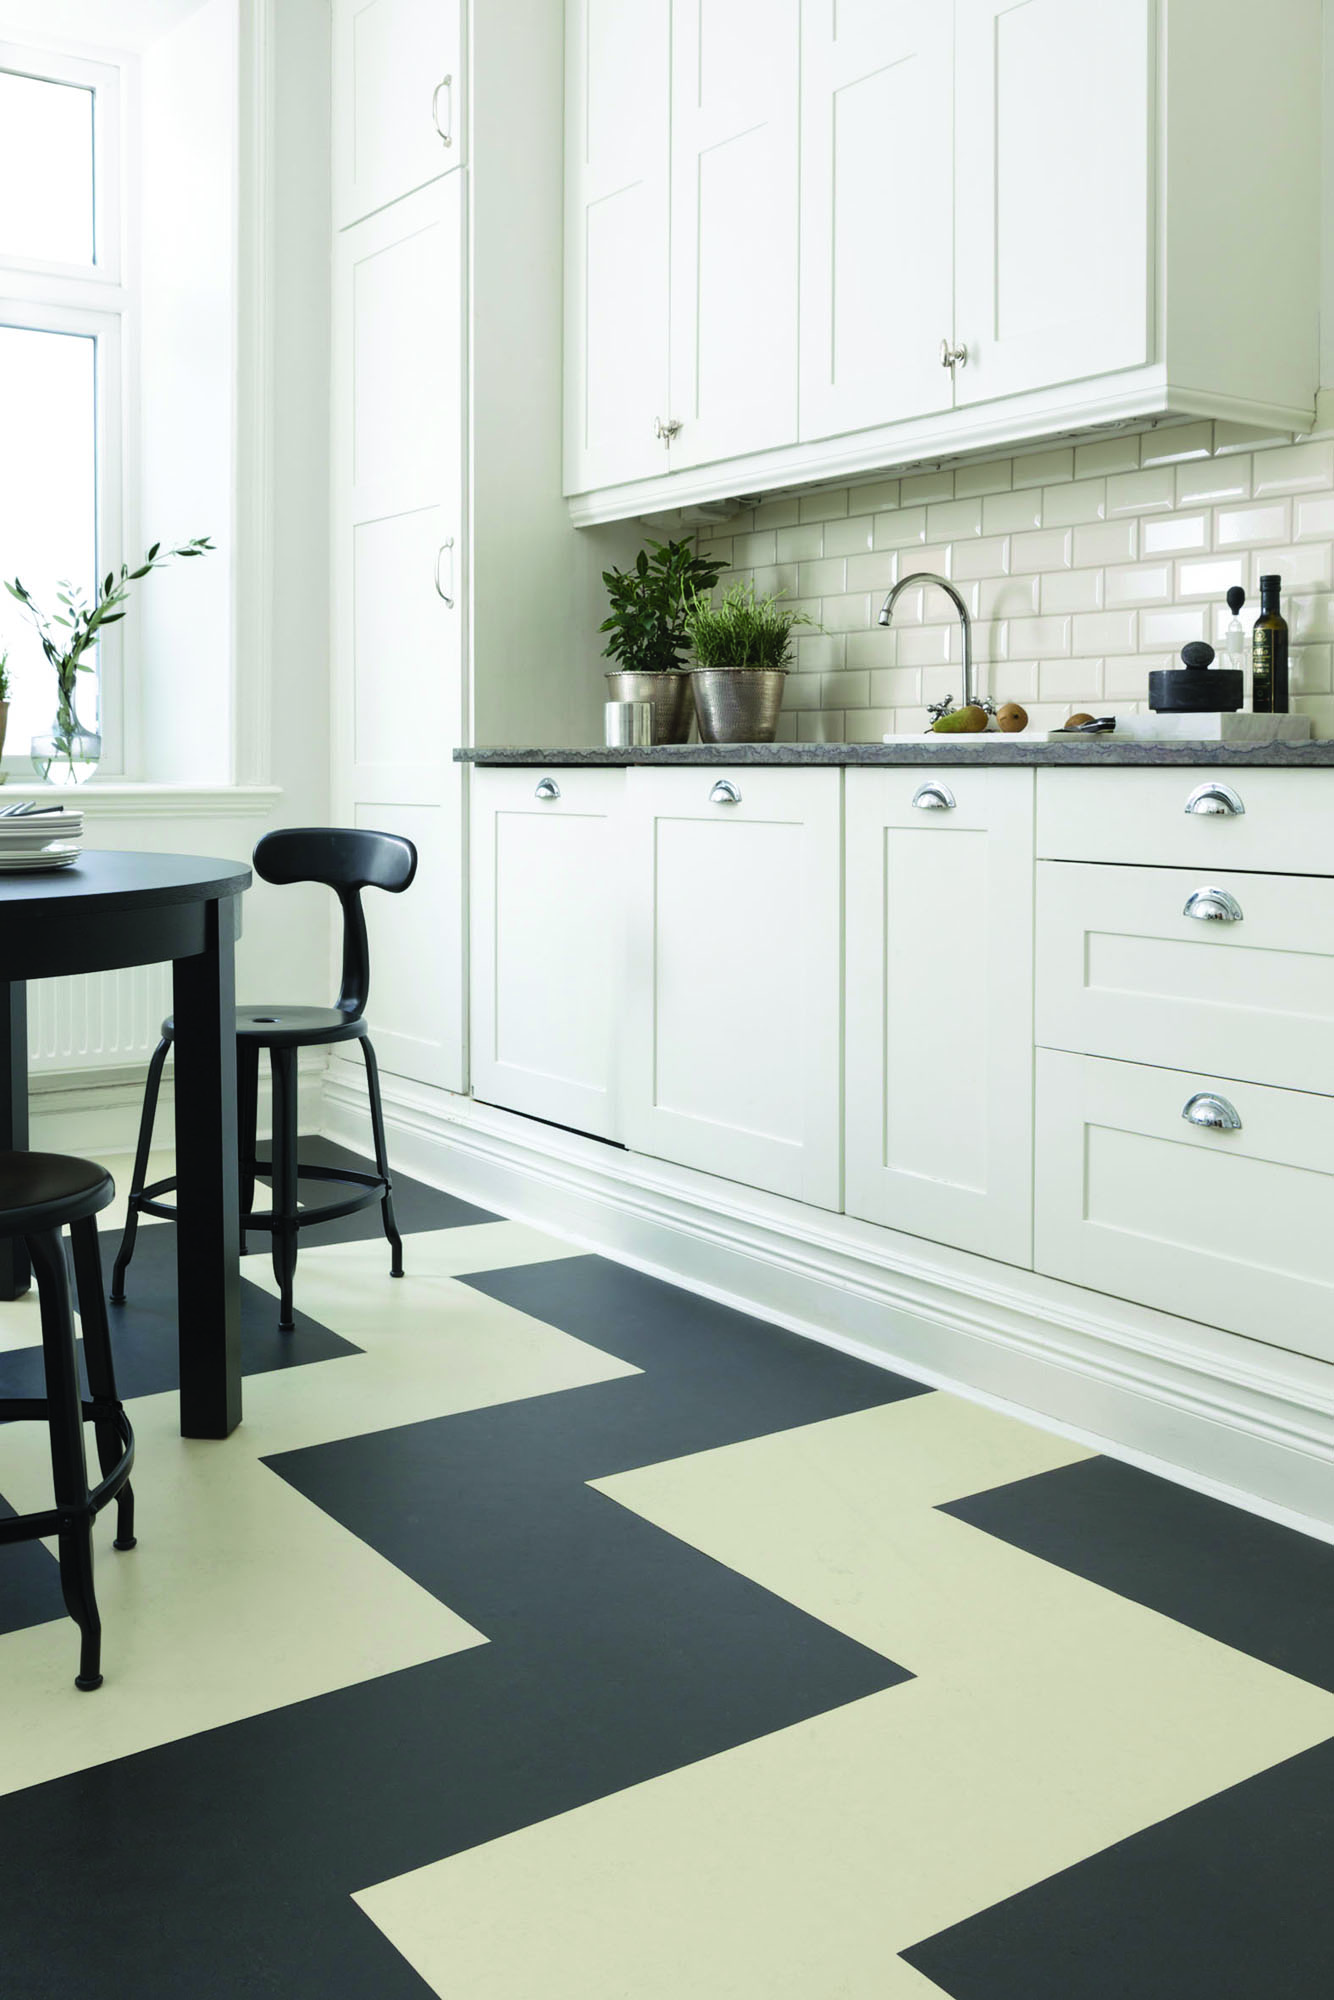 "Marmoleum Click 12"" x 36"" planks and 12"" square CinchLOC tiles"